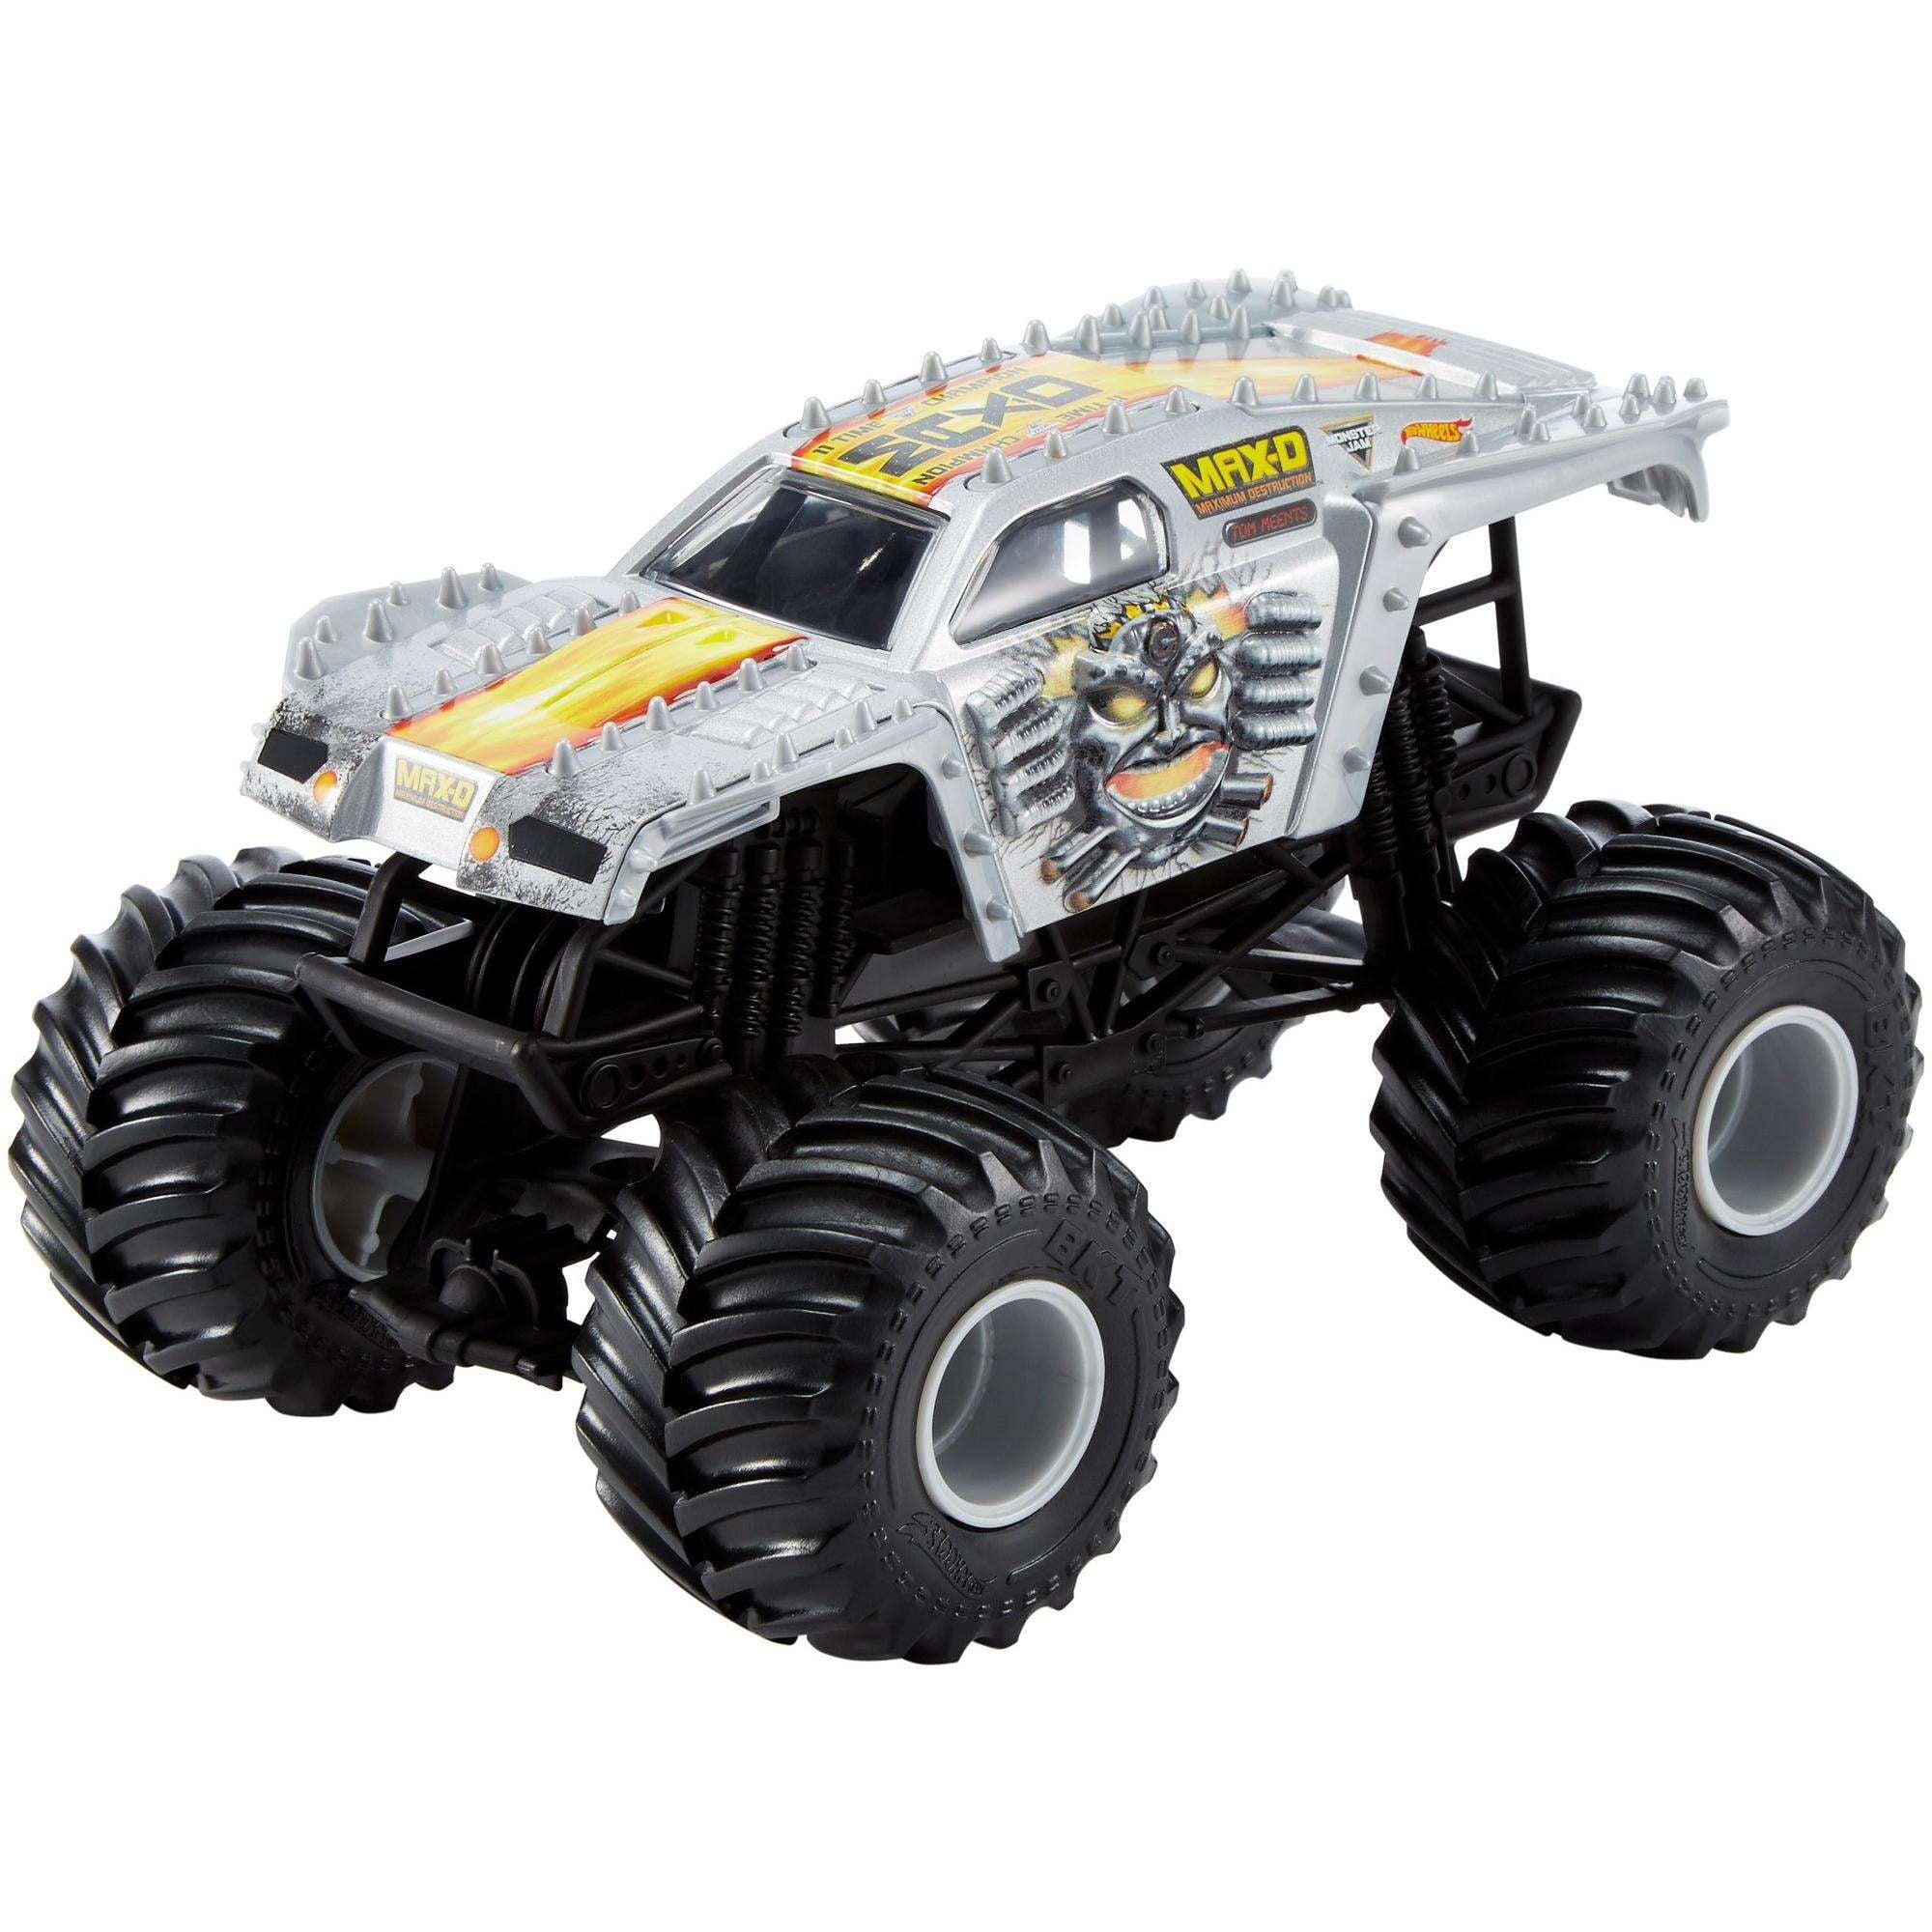 Hot Wheels Monster Jam MaxD Silver Vehicle